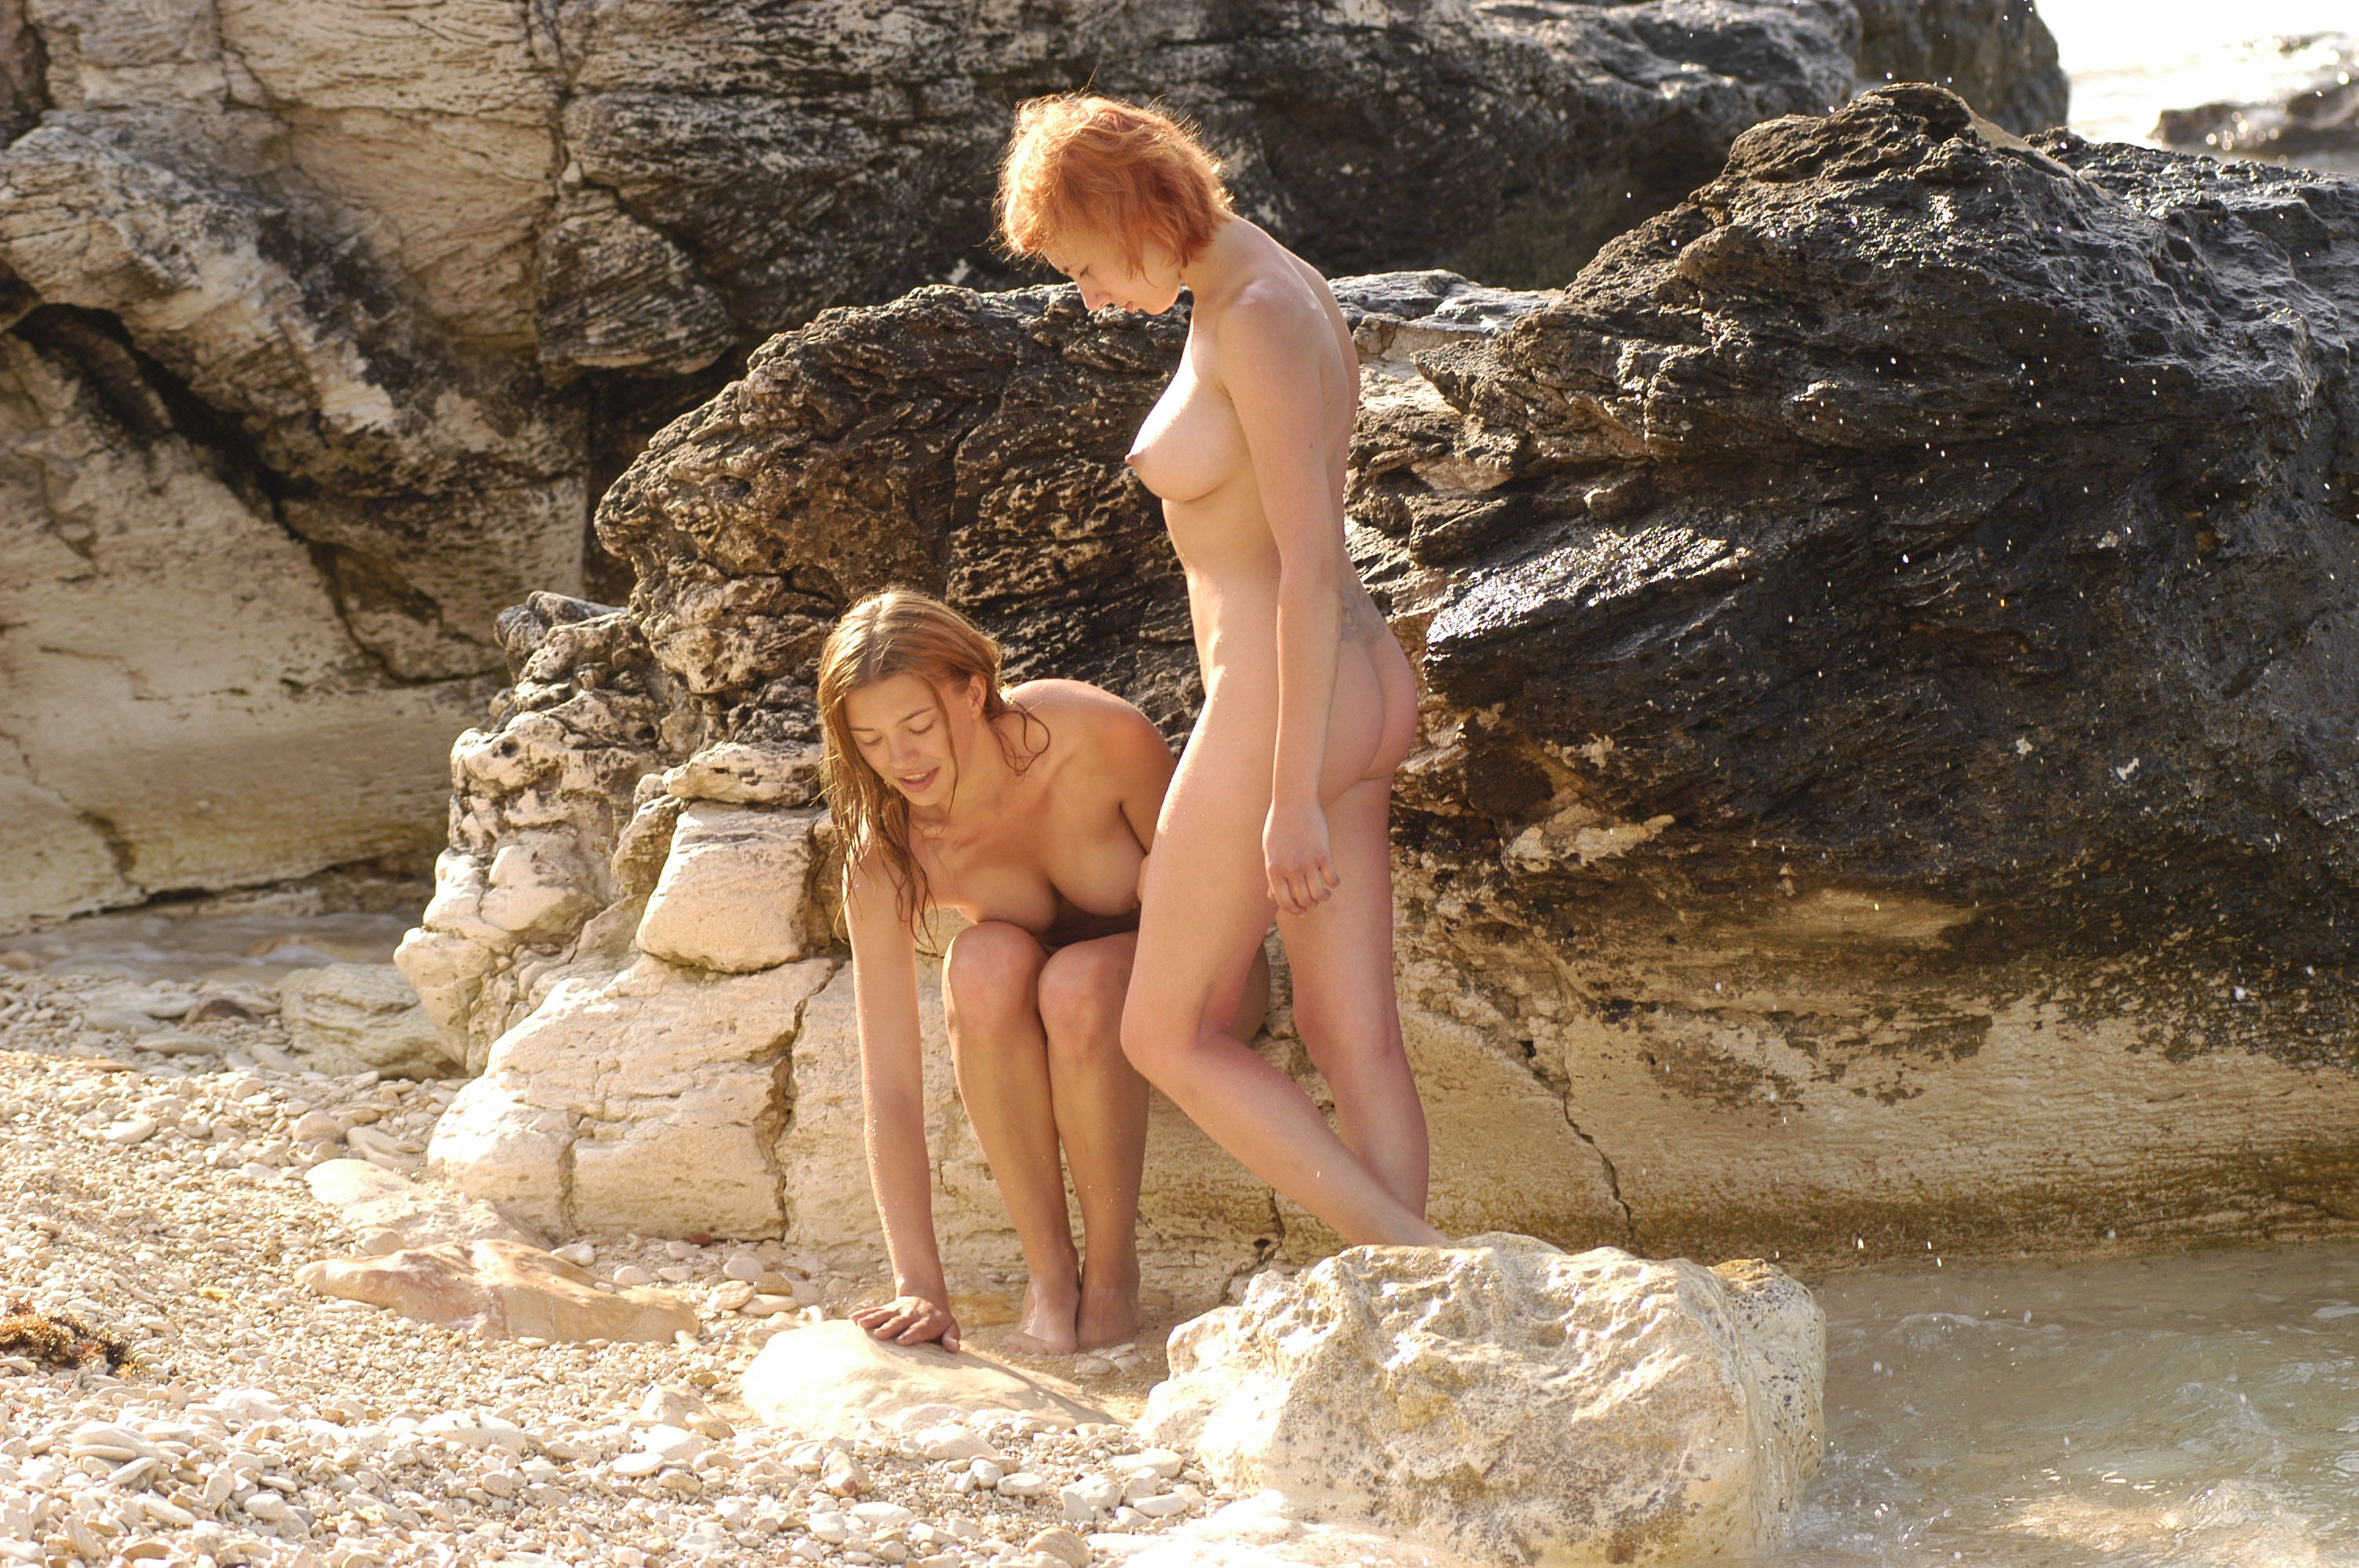 masturbiruet-na-nudistskom-plyazhe